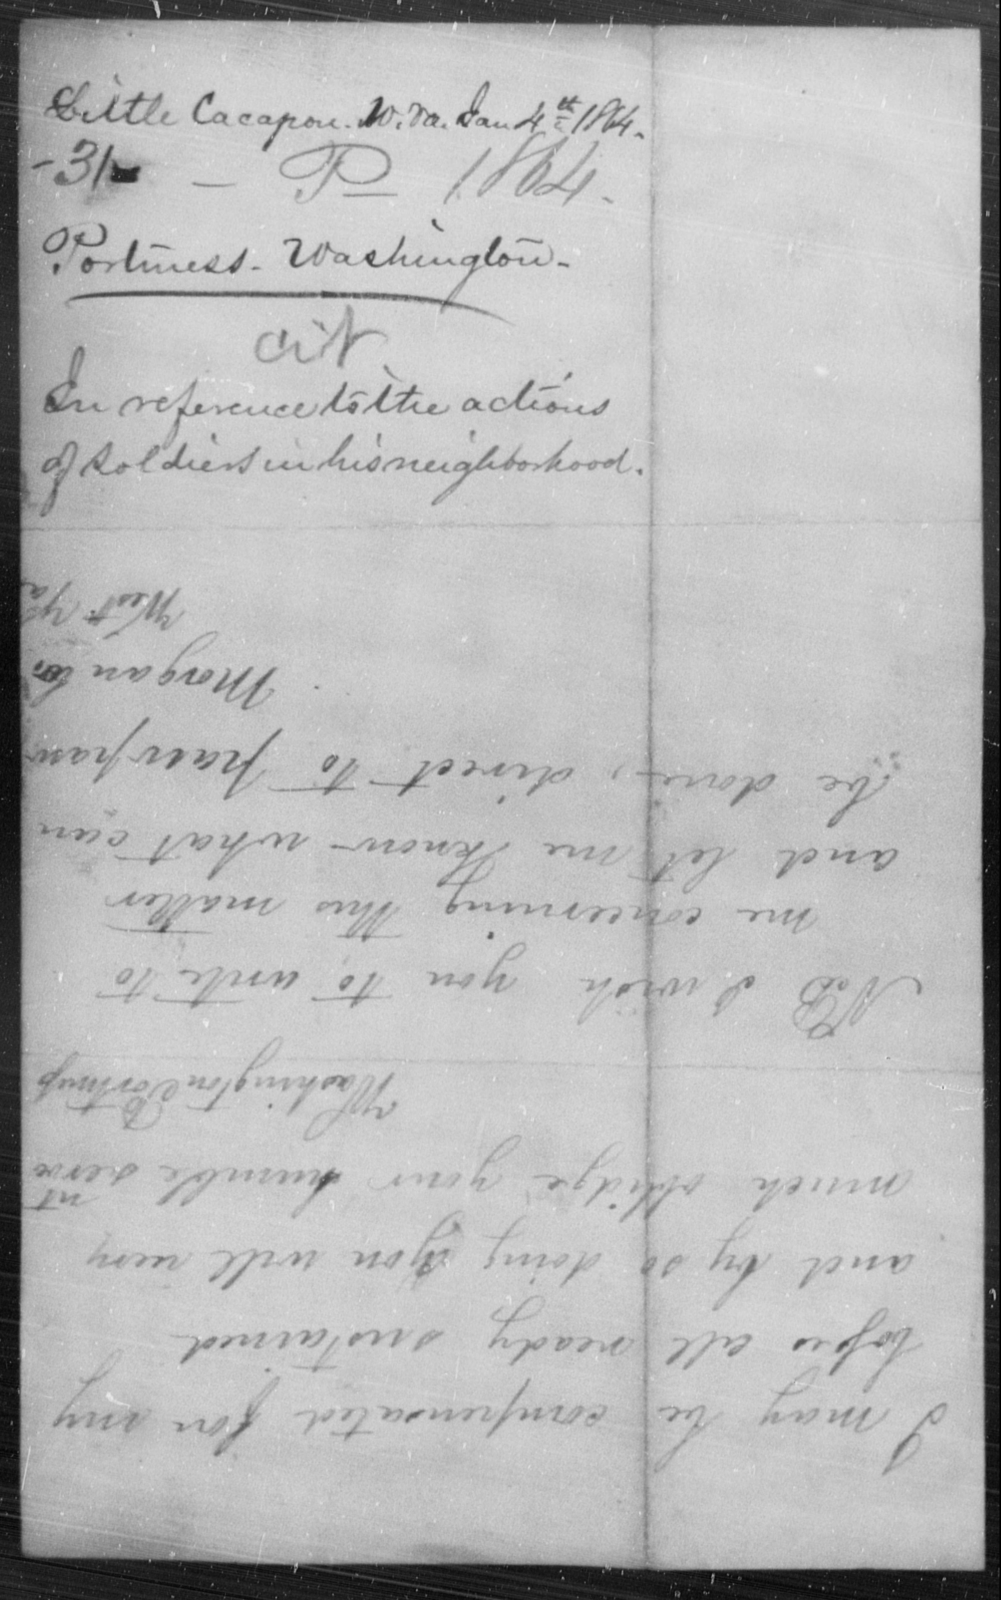 Portmess, Washington - State: West Virginia - Year: 1864